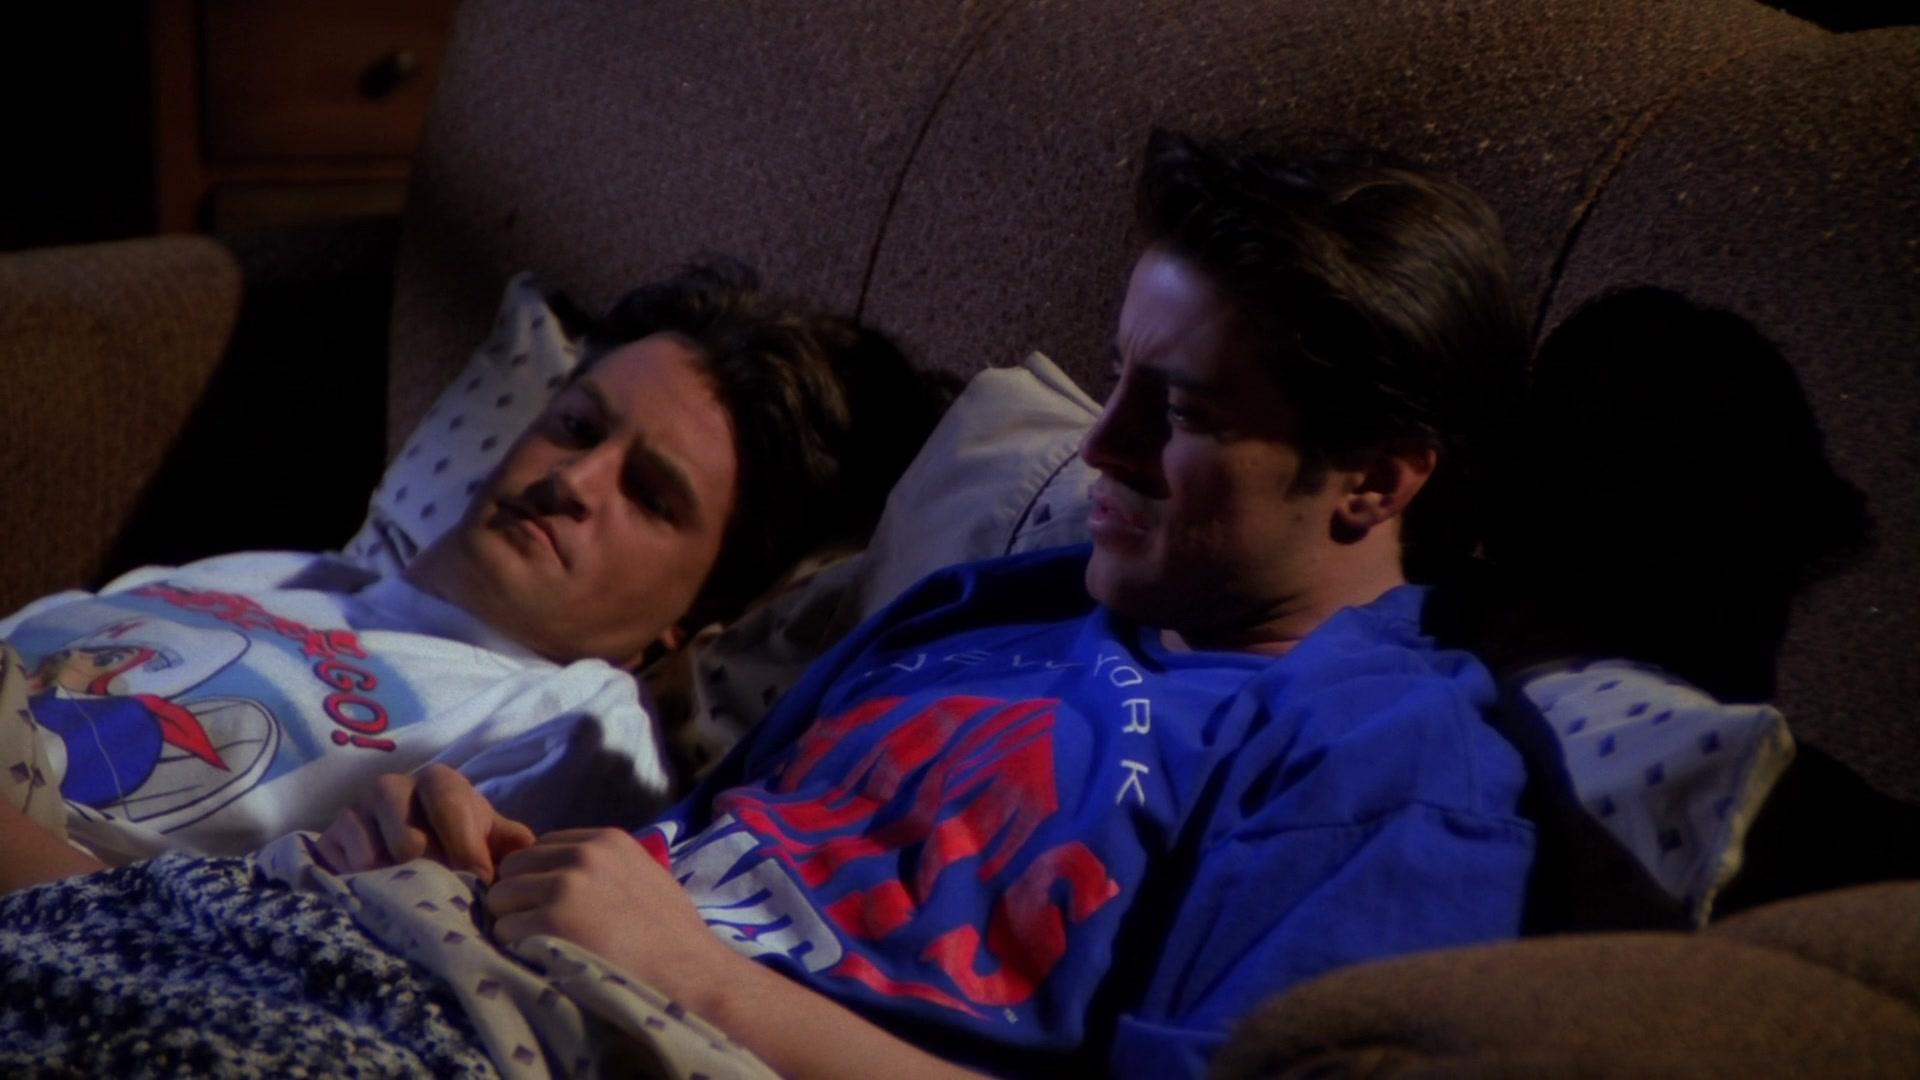 New York Giants American Football Team T-Shirt Worn by Matt LeBlanc